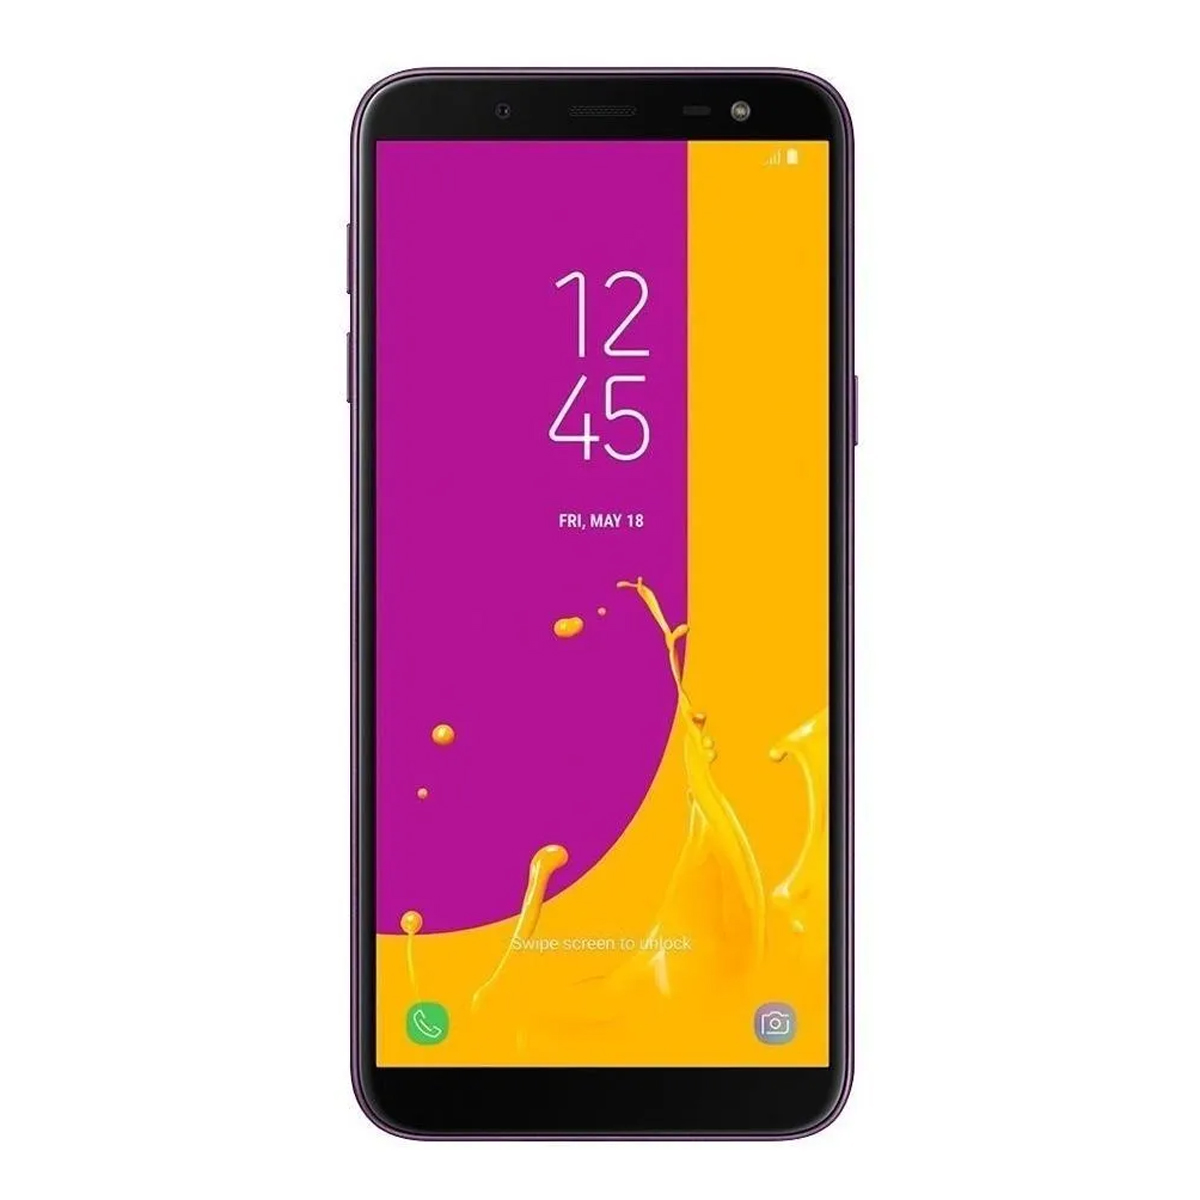 Smartphone Samsung Galaxy J6 J600 Dual Sim Tv 64gb - Mostruário